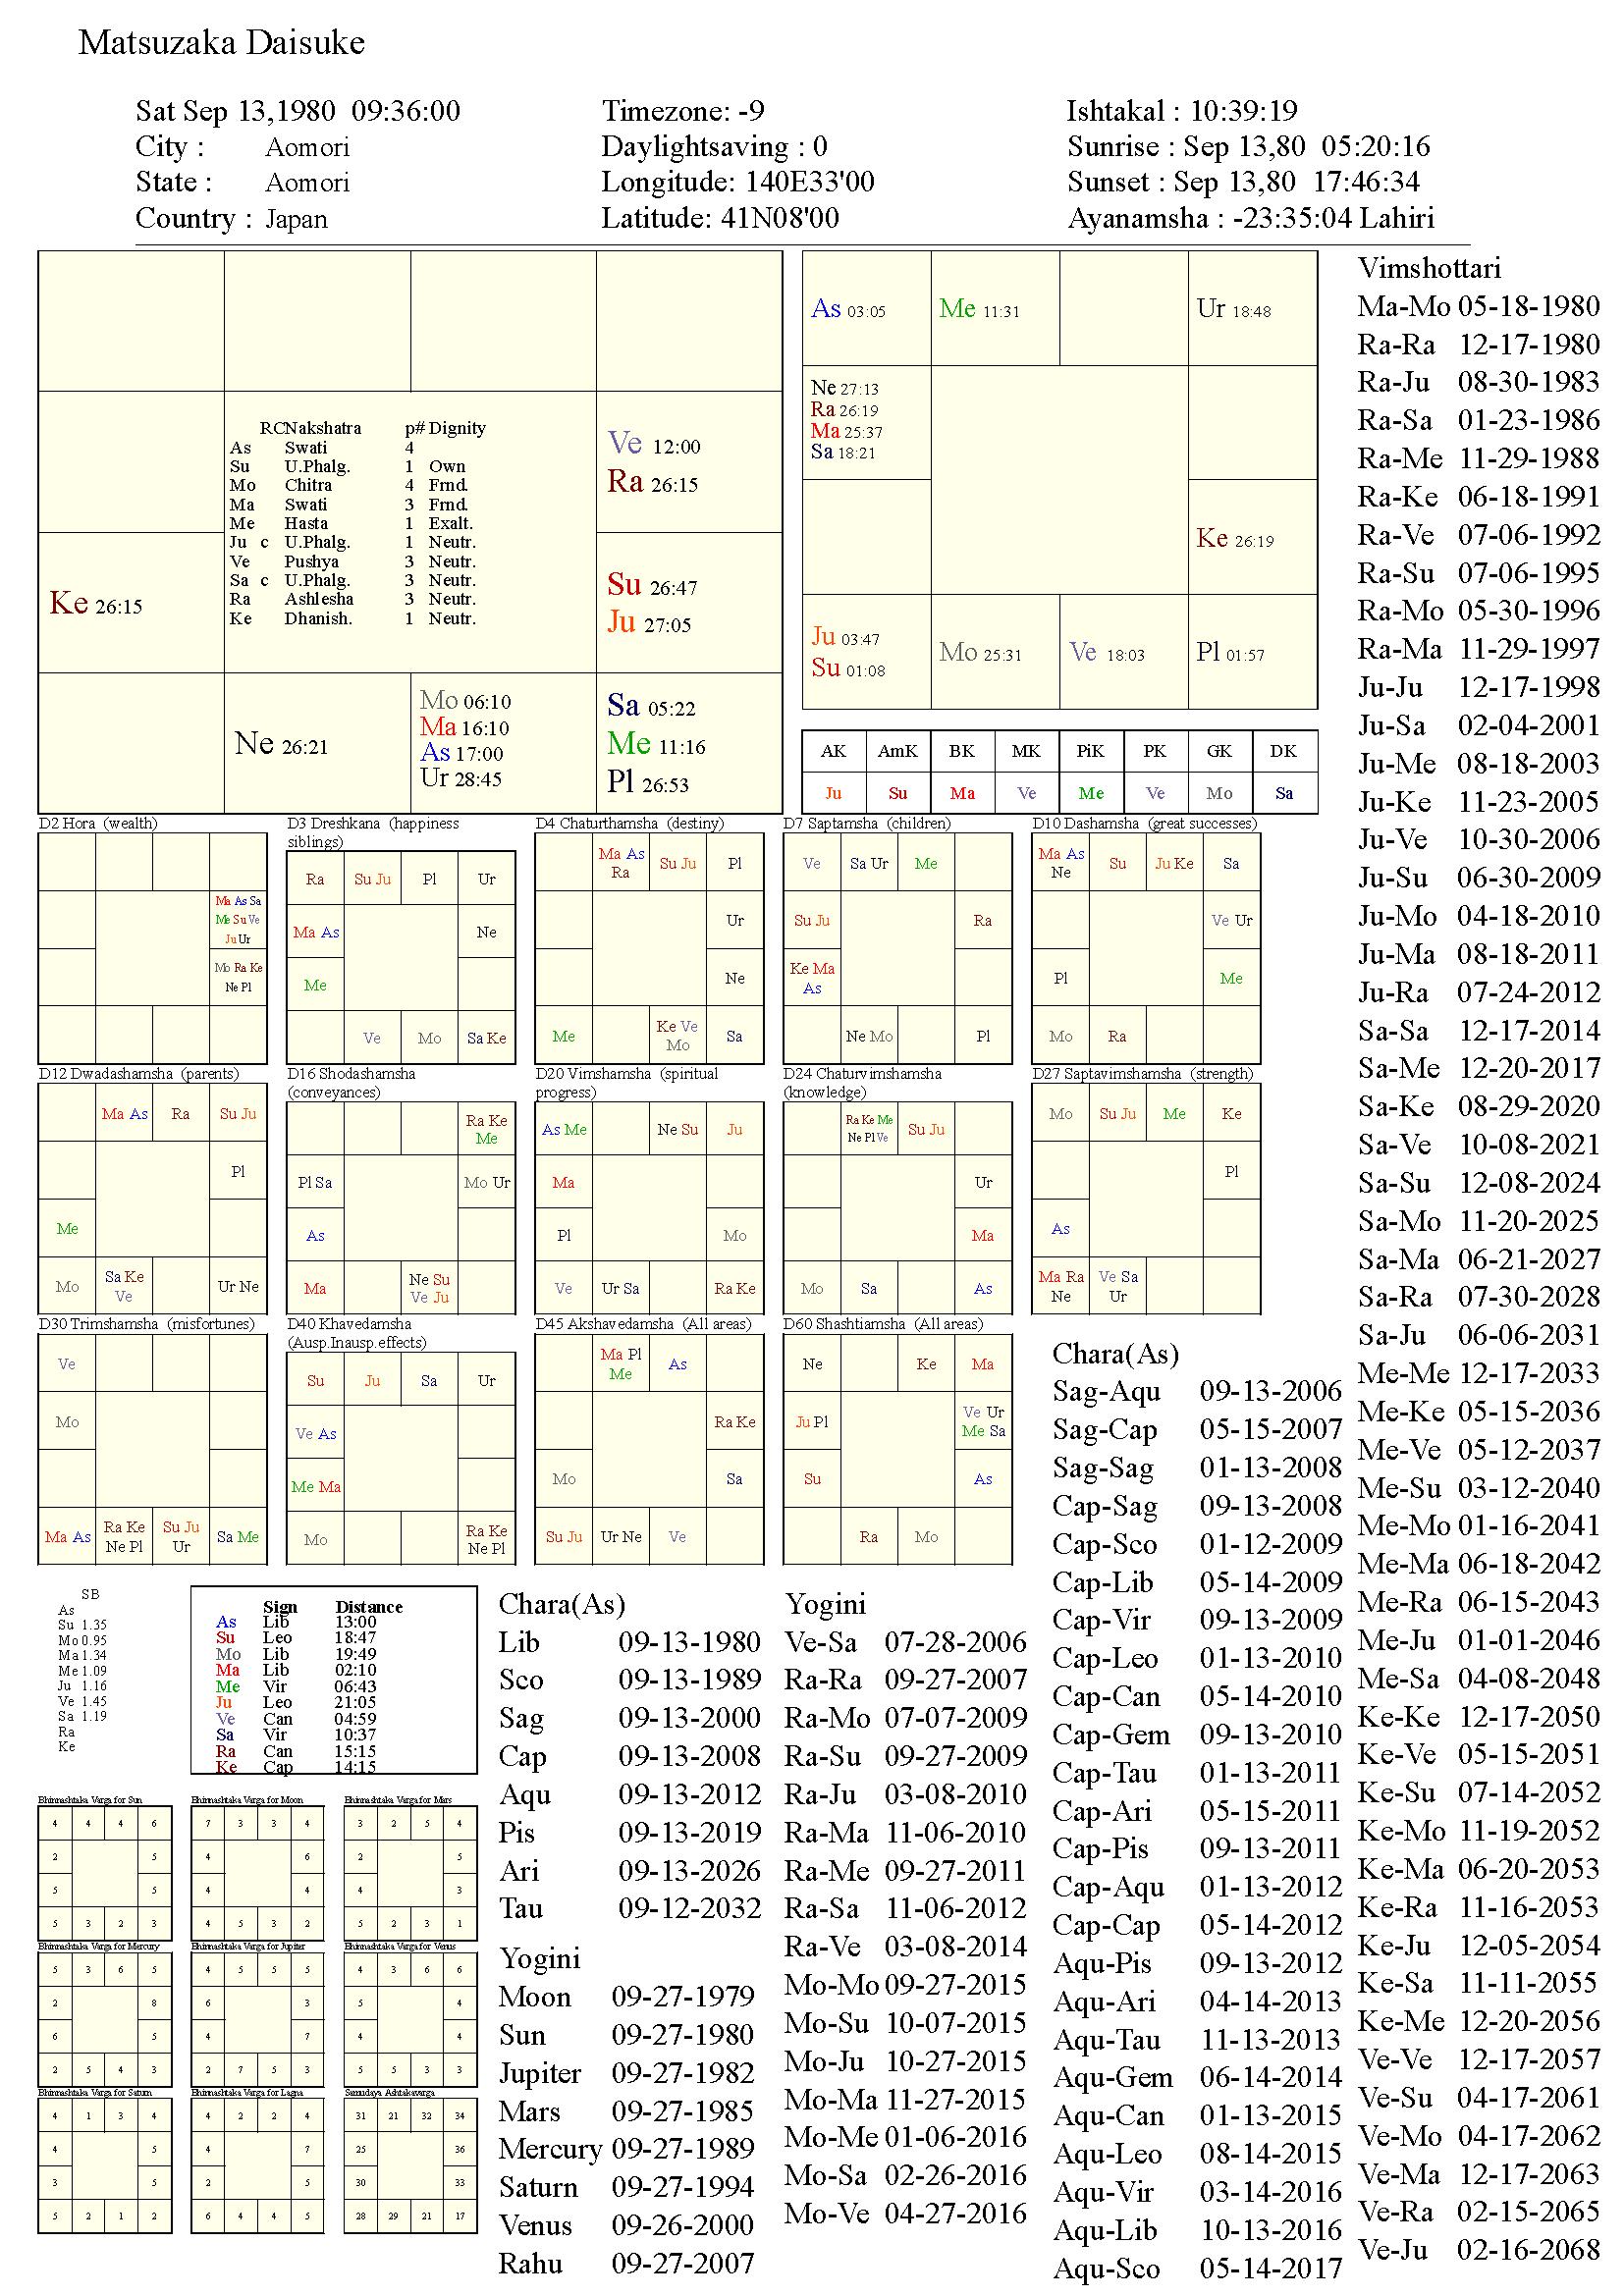 matsuzakadaisuke_chart